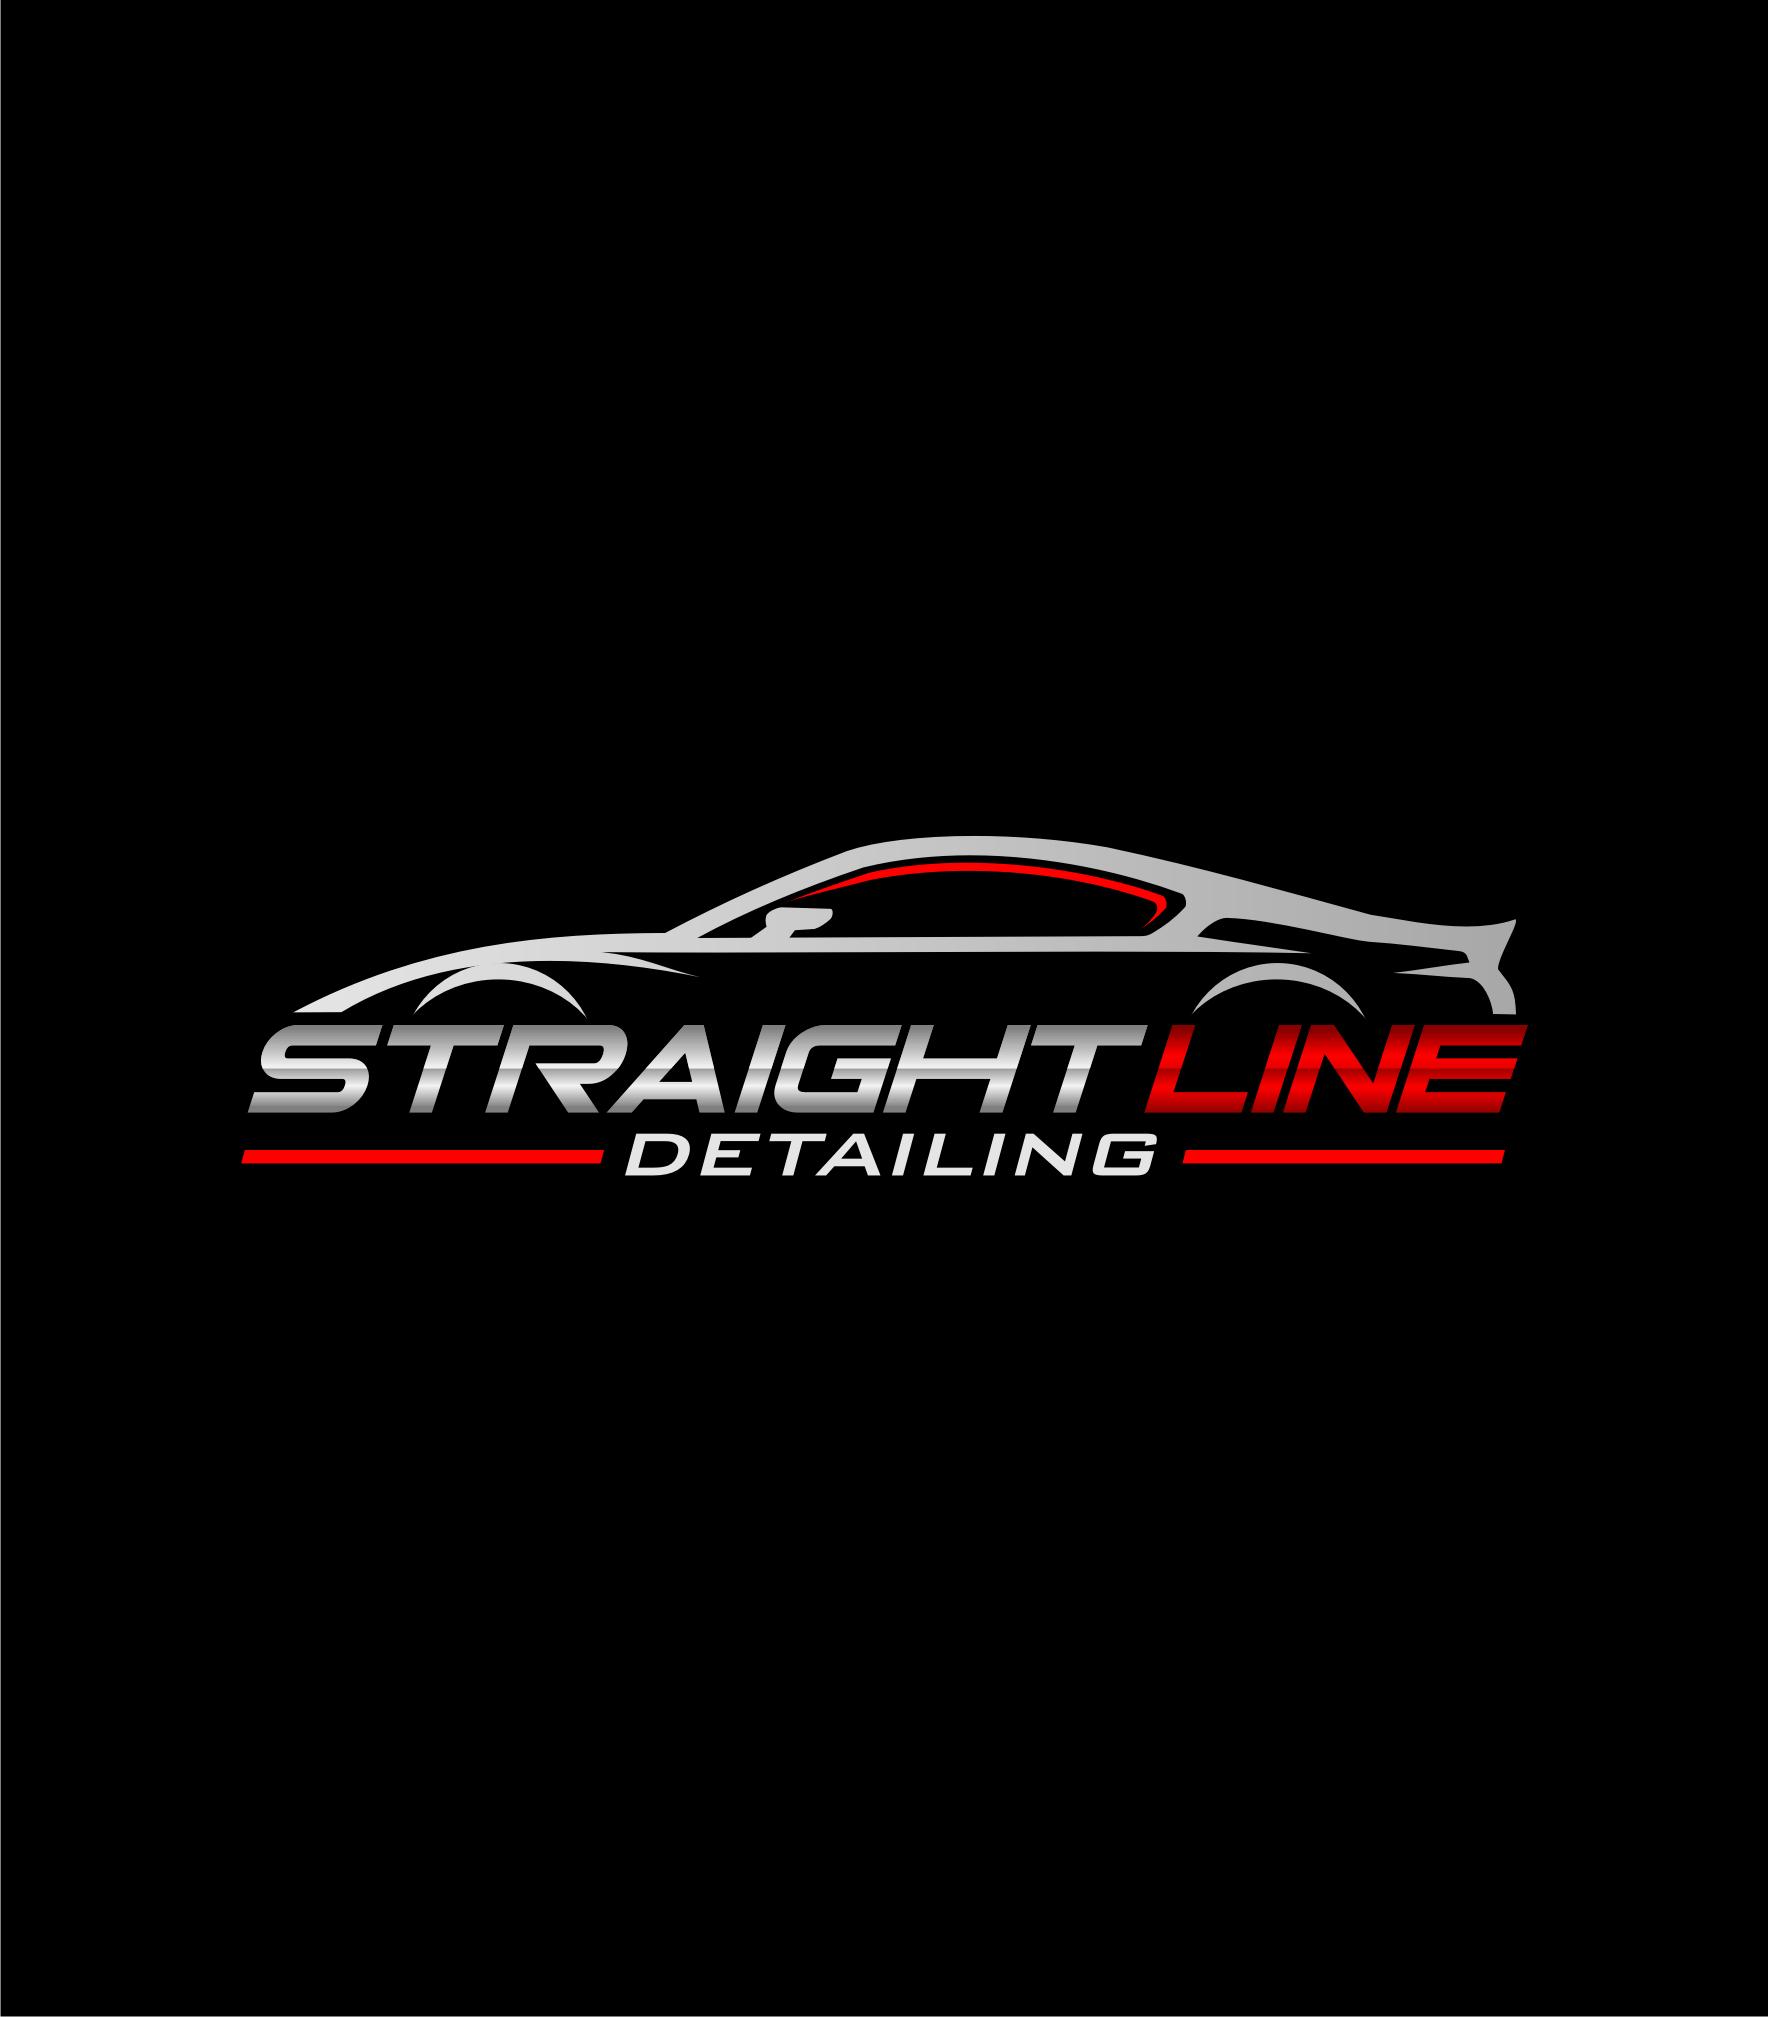 Generic Overused Logo Designs Sold Straightline Automotive